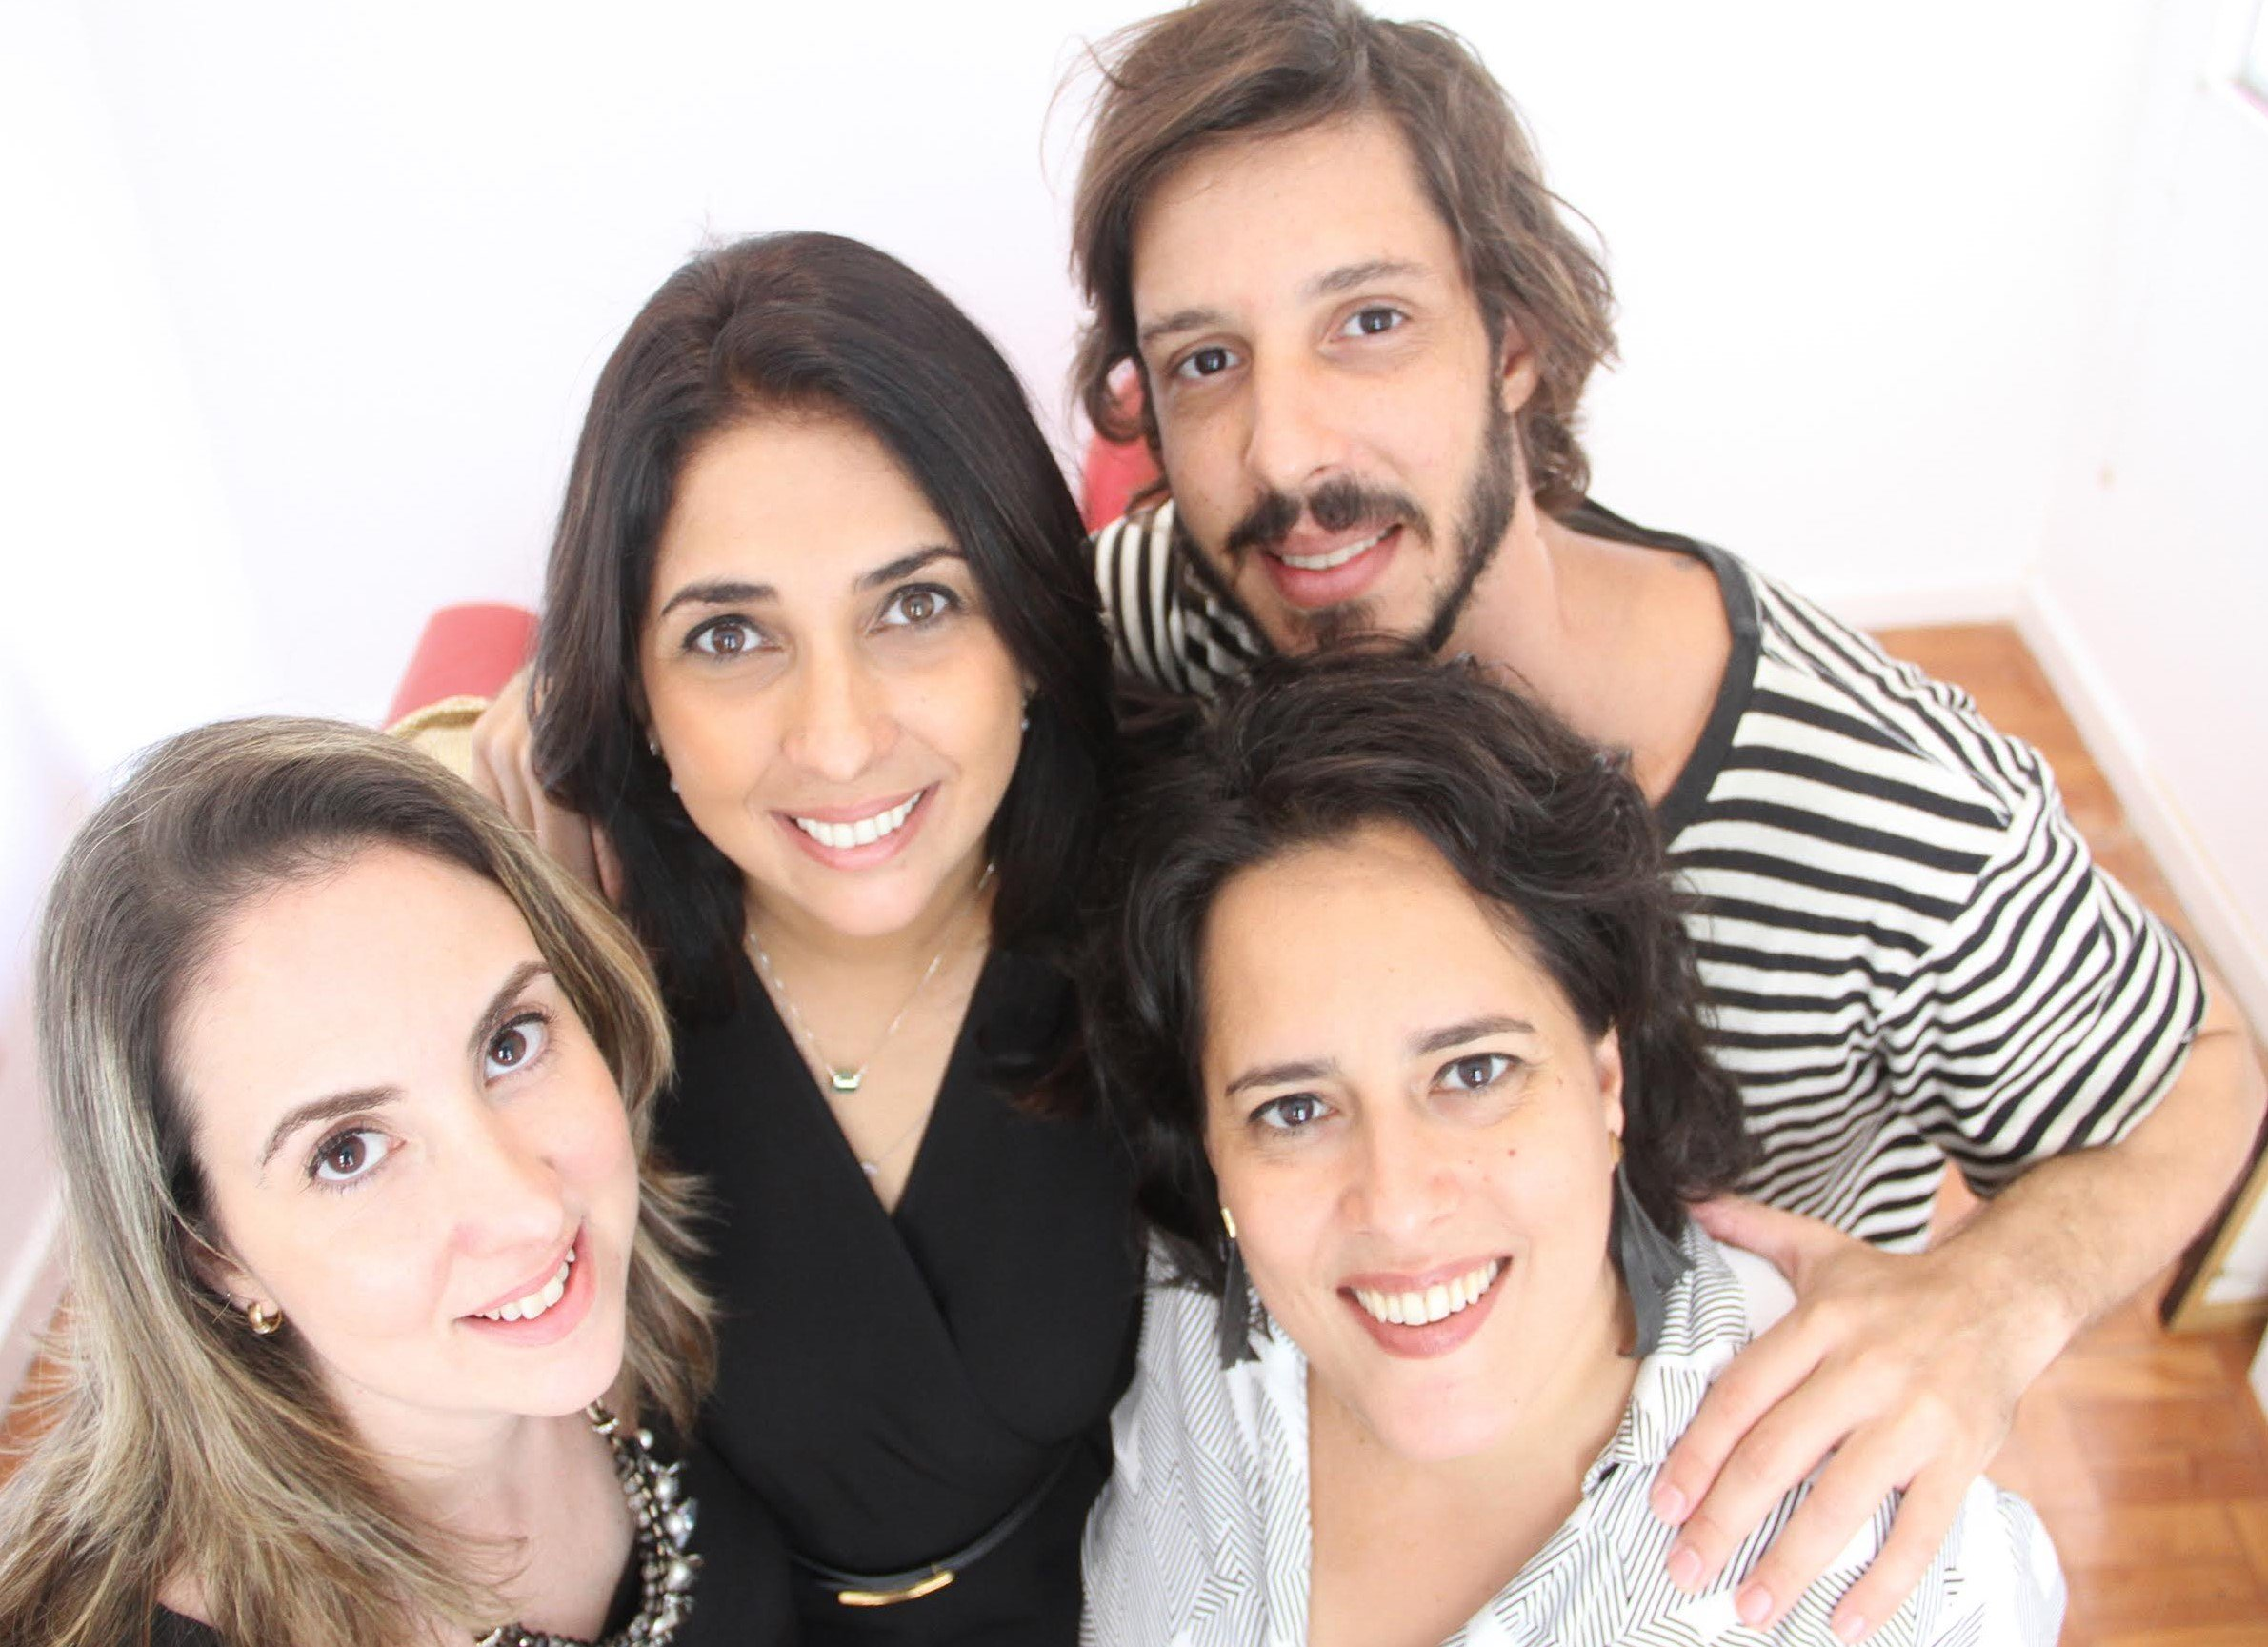 Bia Cavalcanti, Elisangela Valadares, Carina Morandi e Gabriel Antonini: sócios inauguram a EV Projects / Foto: Maira Bittencourt